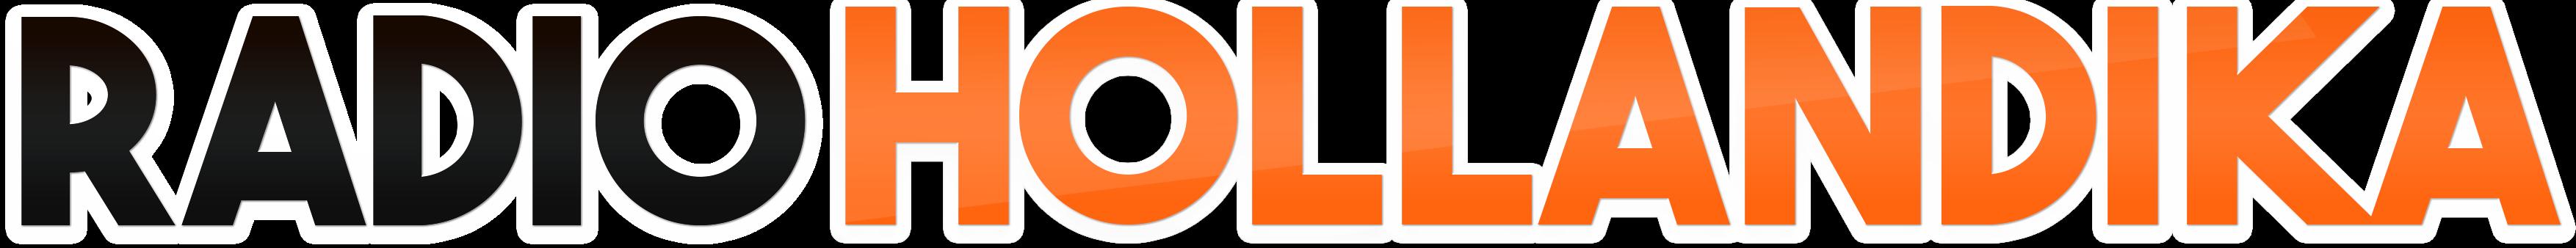 Radio Hollandika